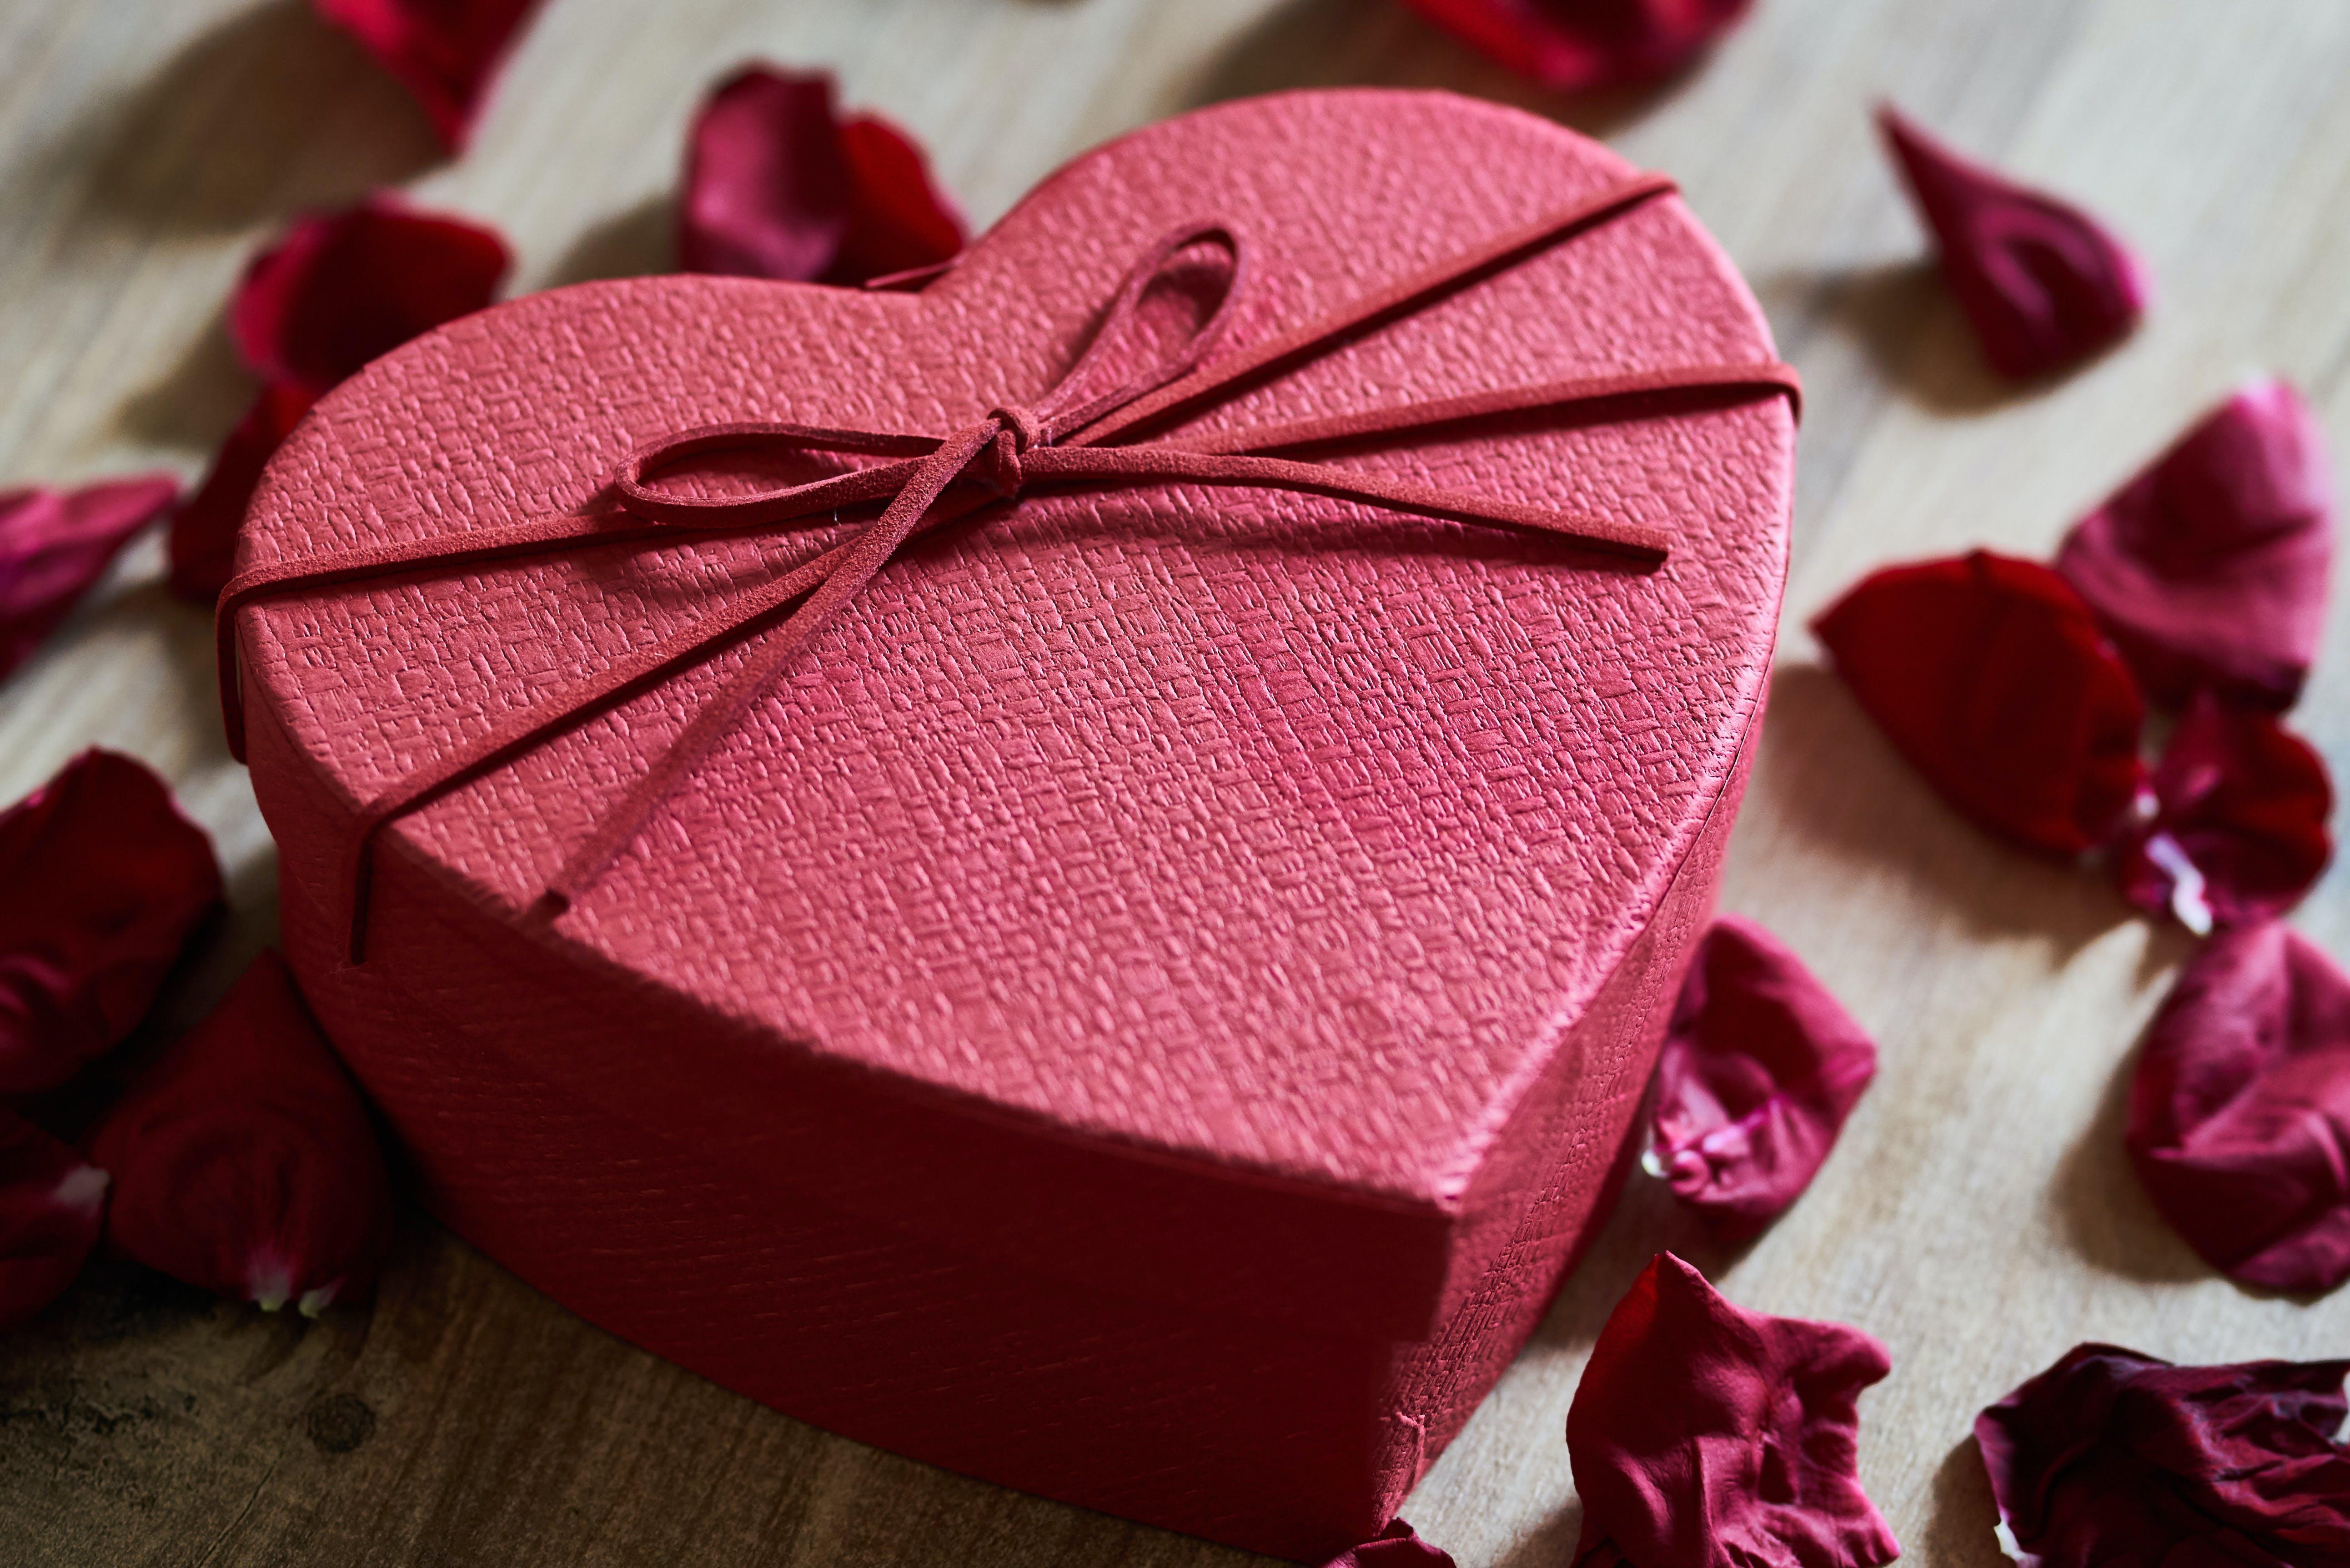 Free stock photo of box, gift, heart, love